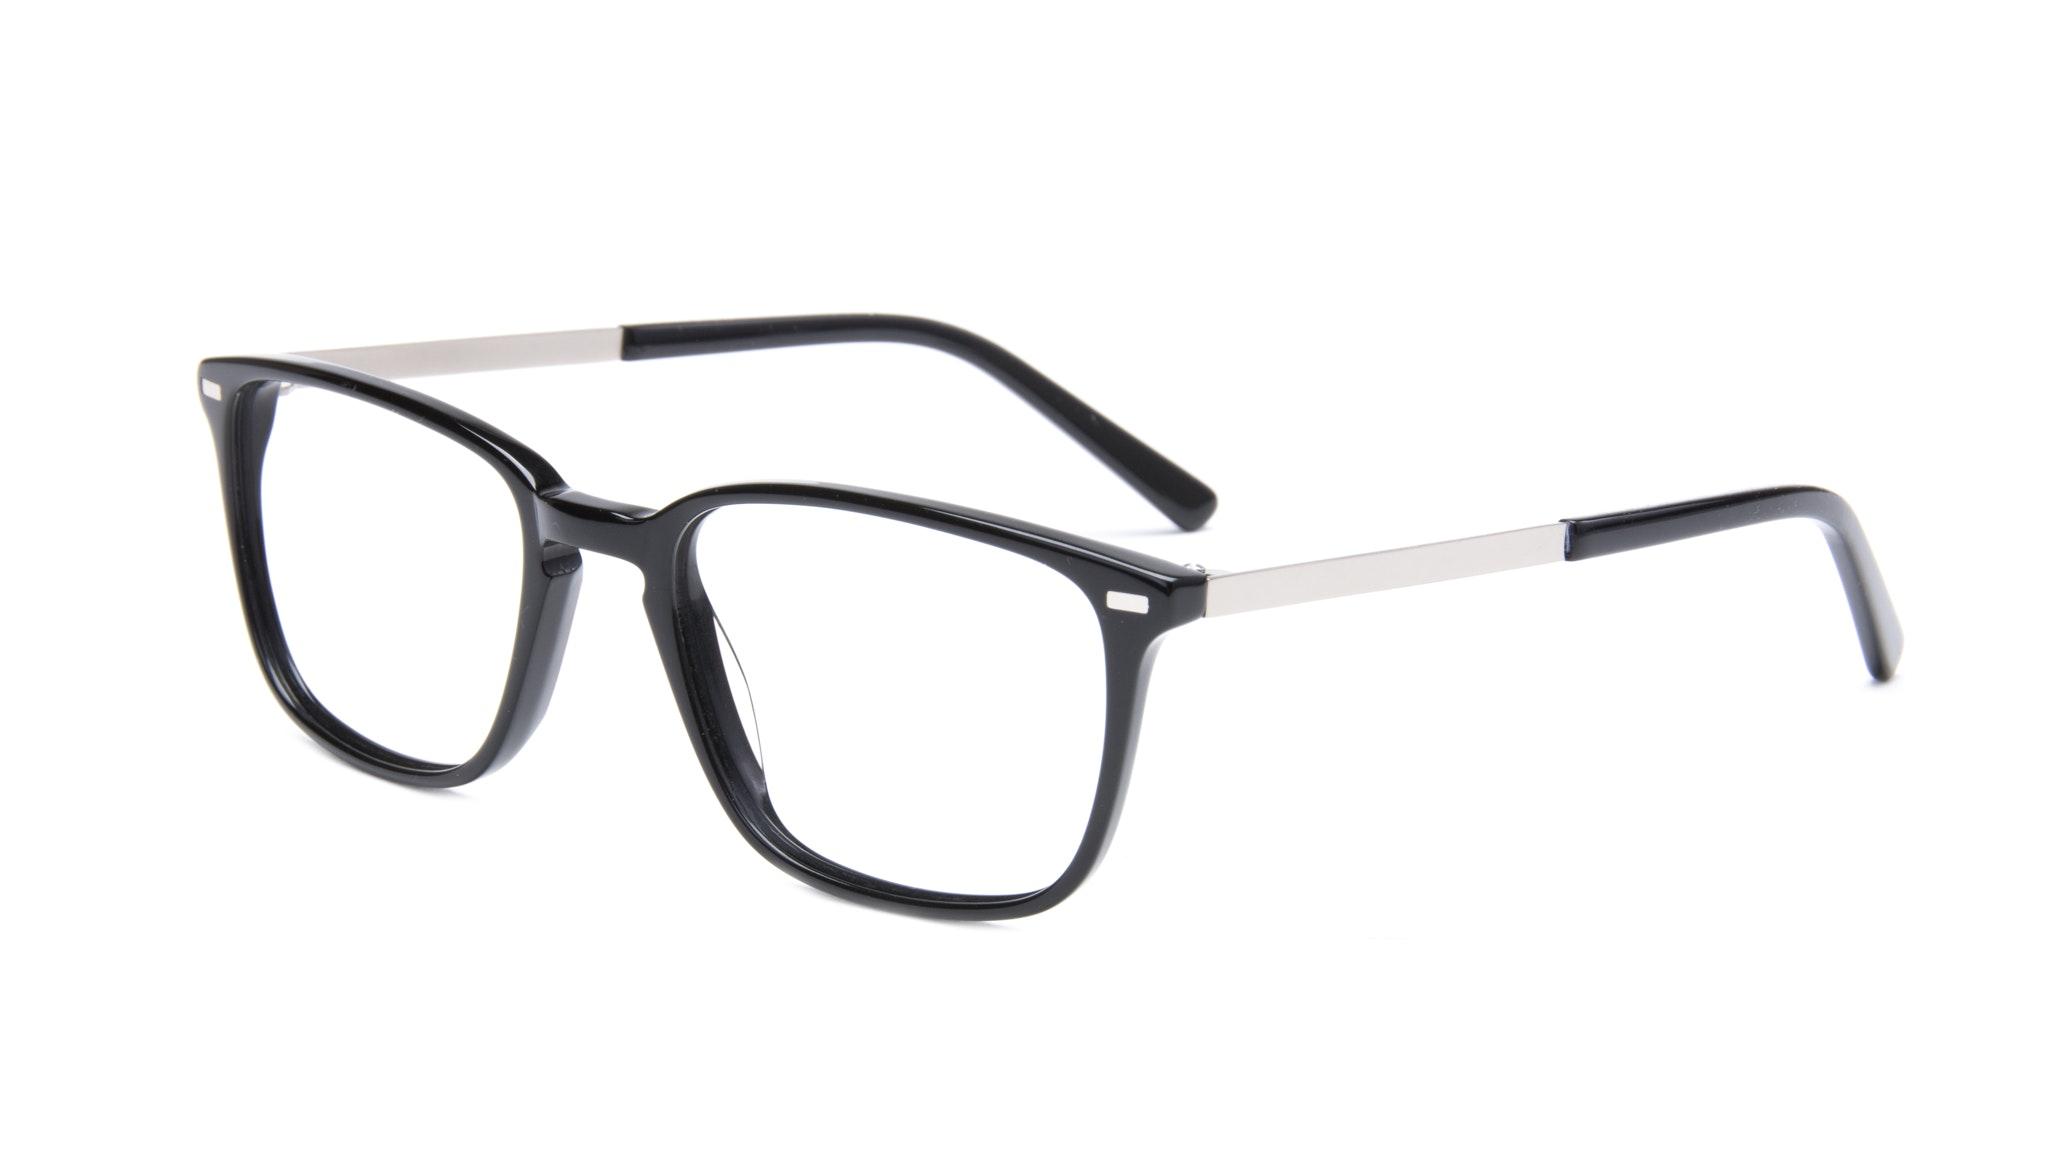 Affordable Fashion Glasses Rectangle Eyeglasses Men Sharp Black Tilt